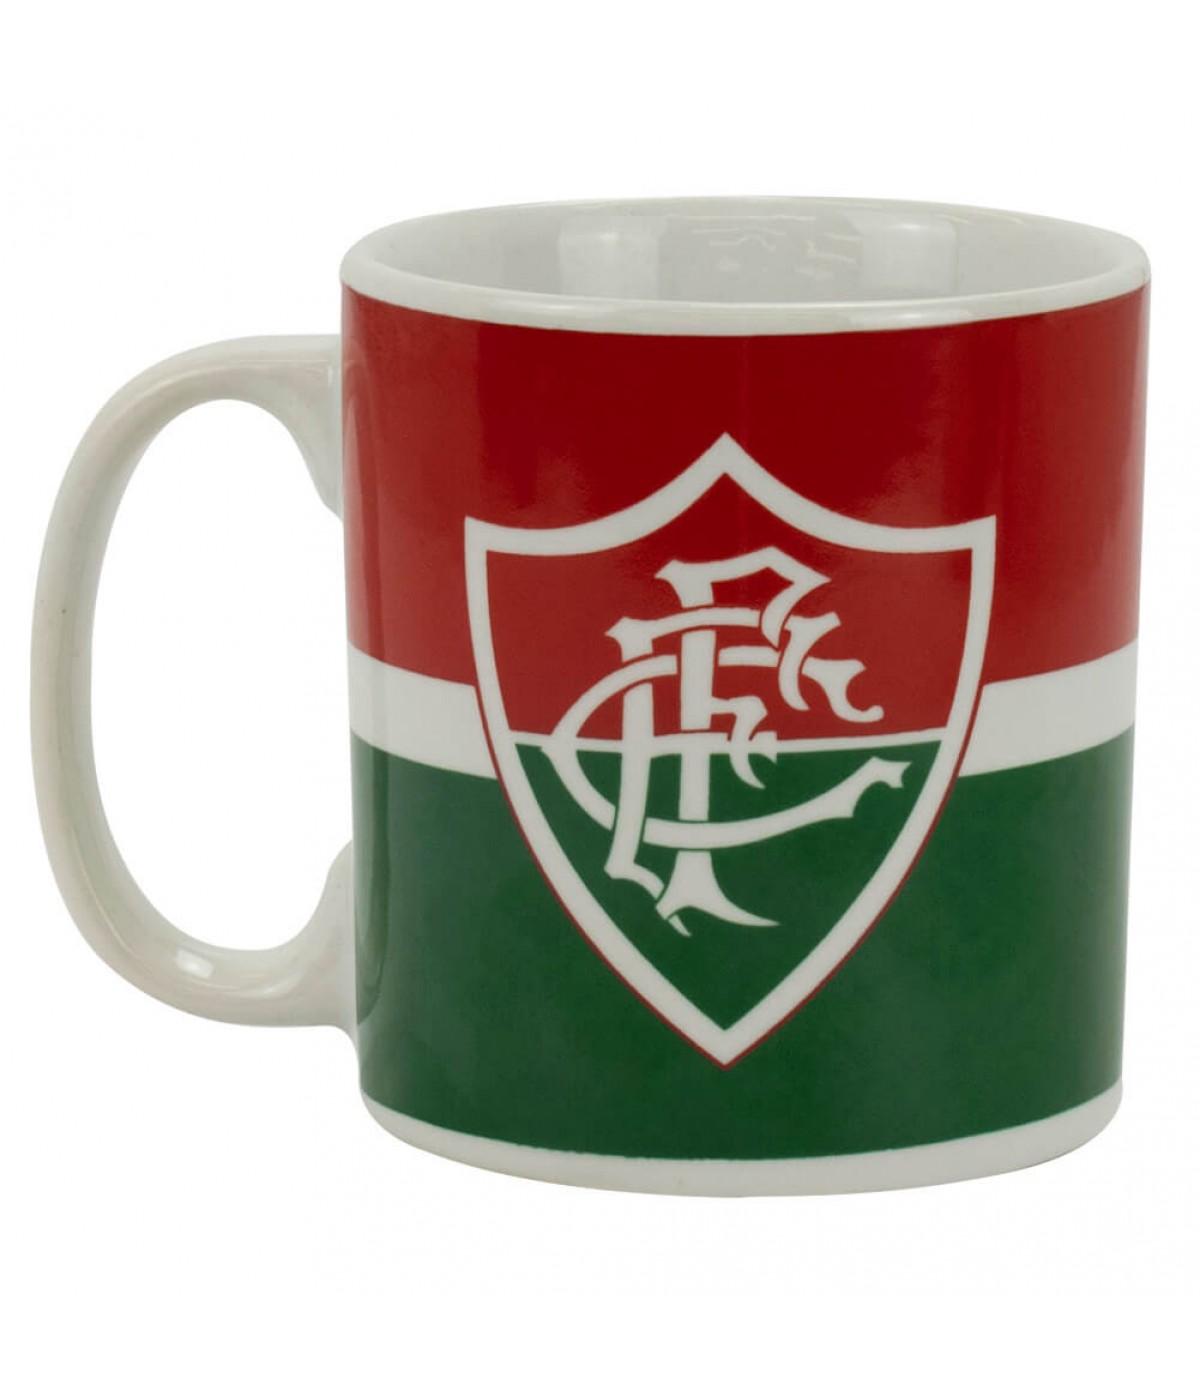 Caneca Porcelana 300ml - Fluminense